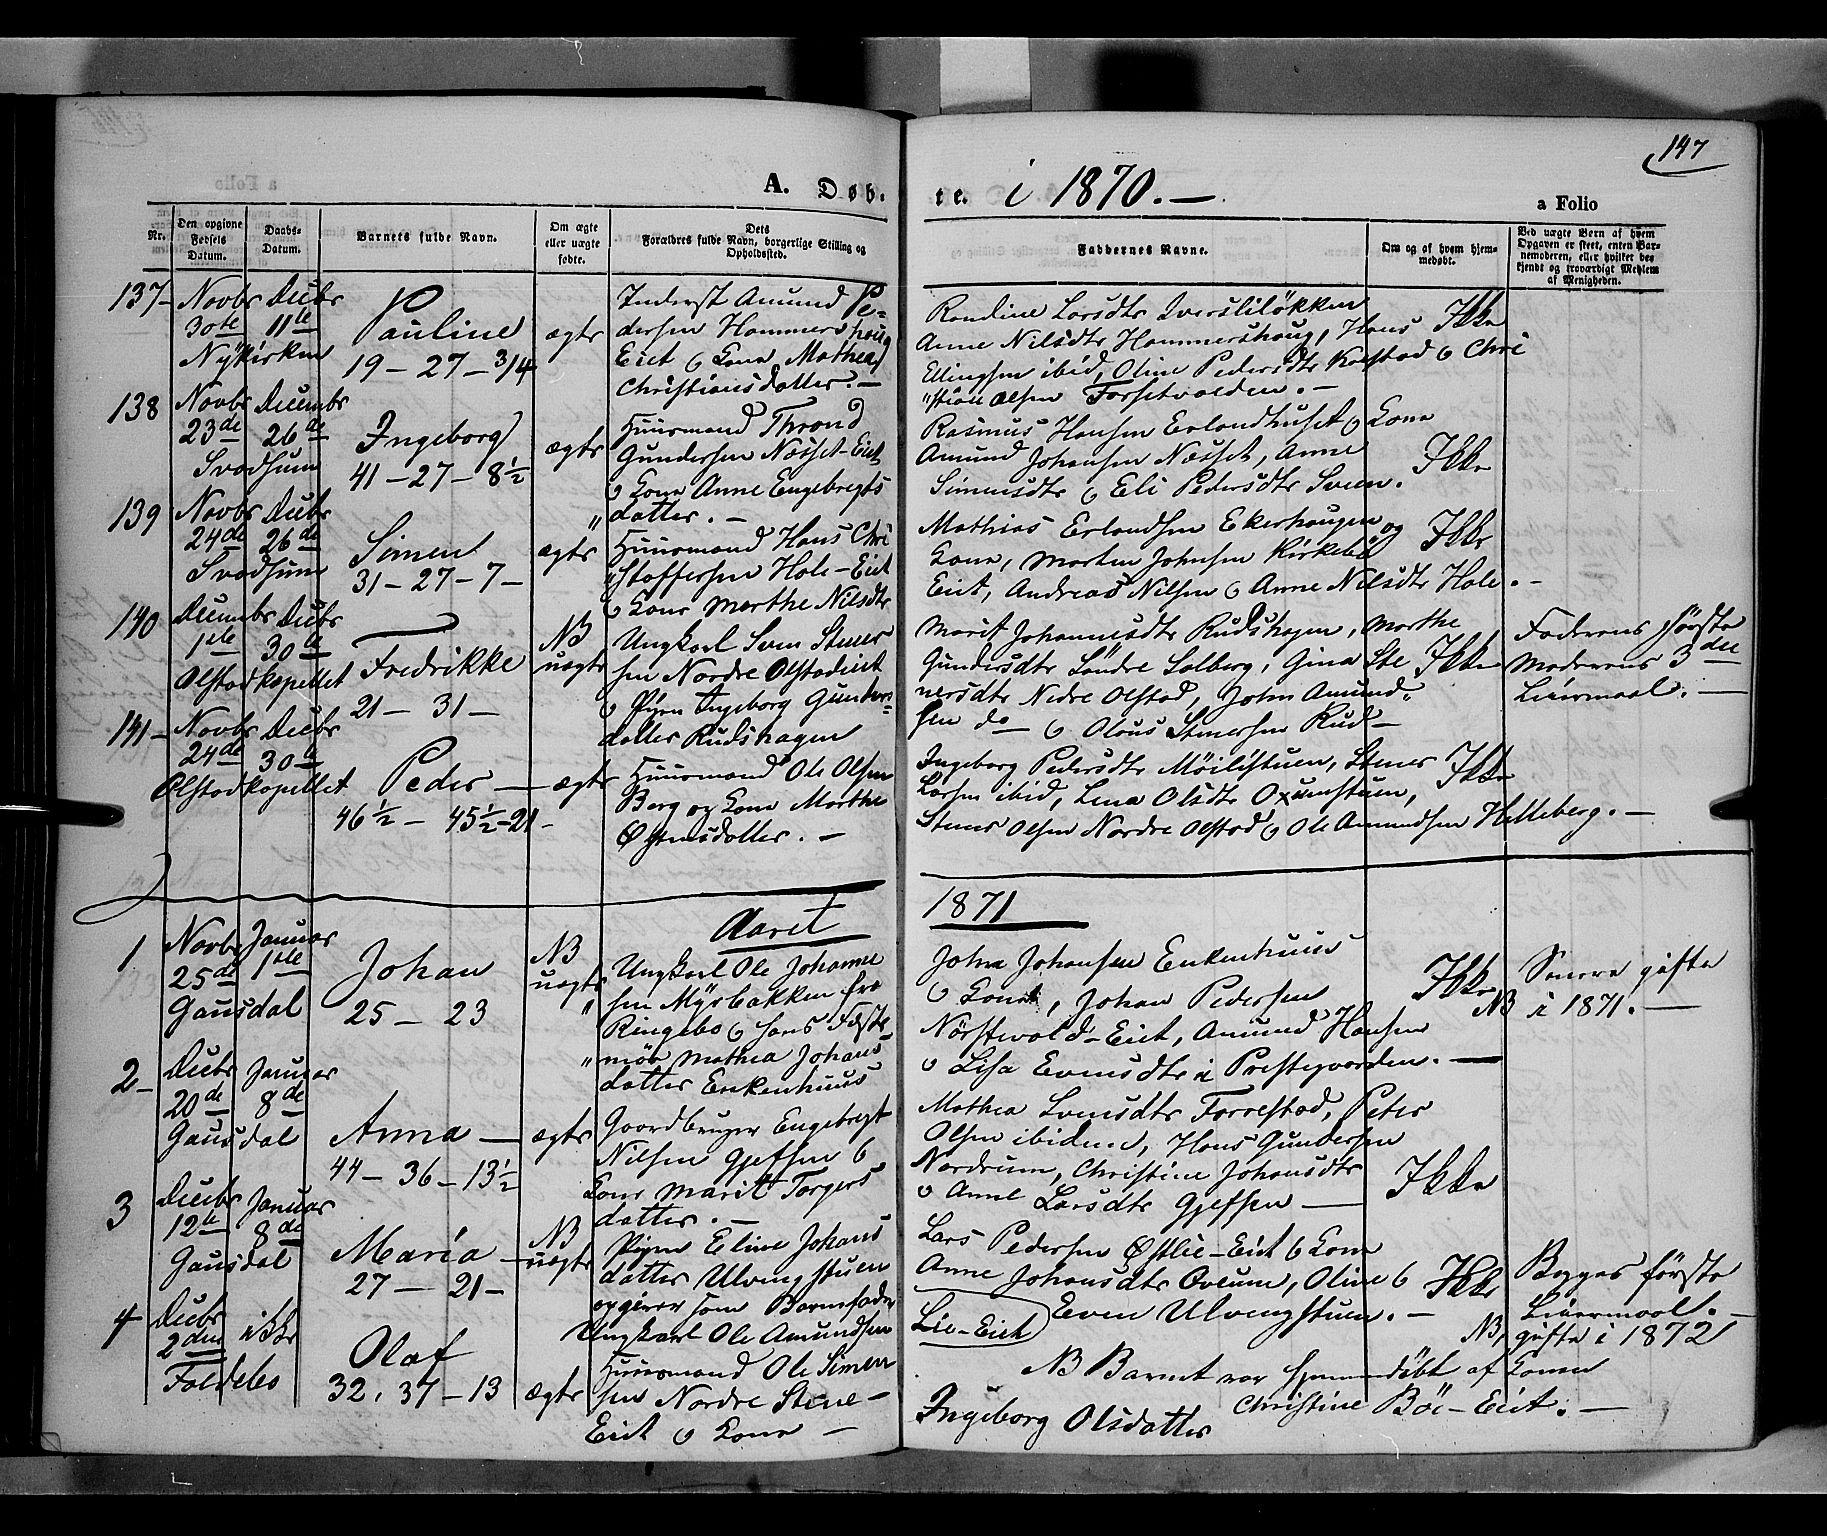 SAH, Gausdal prestekontor, Ministerialbok nr. 9, 1862-1873, s. 147